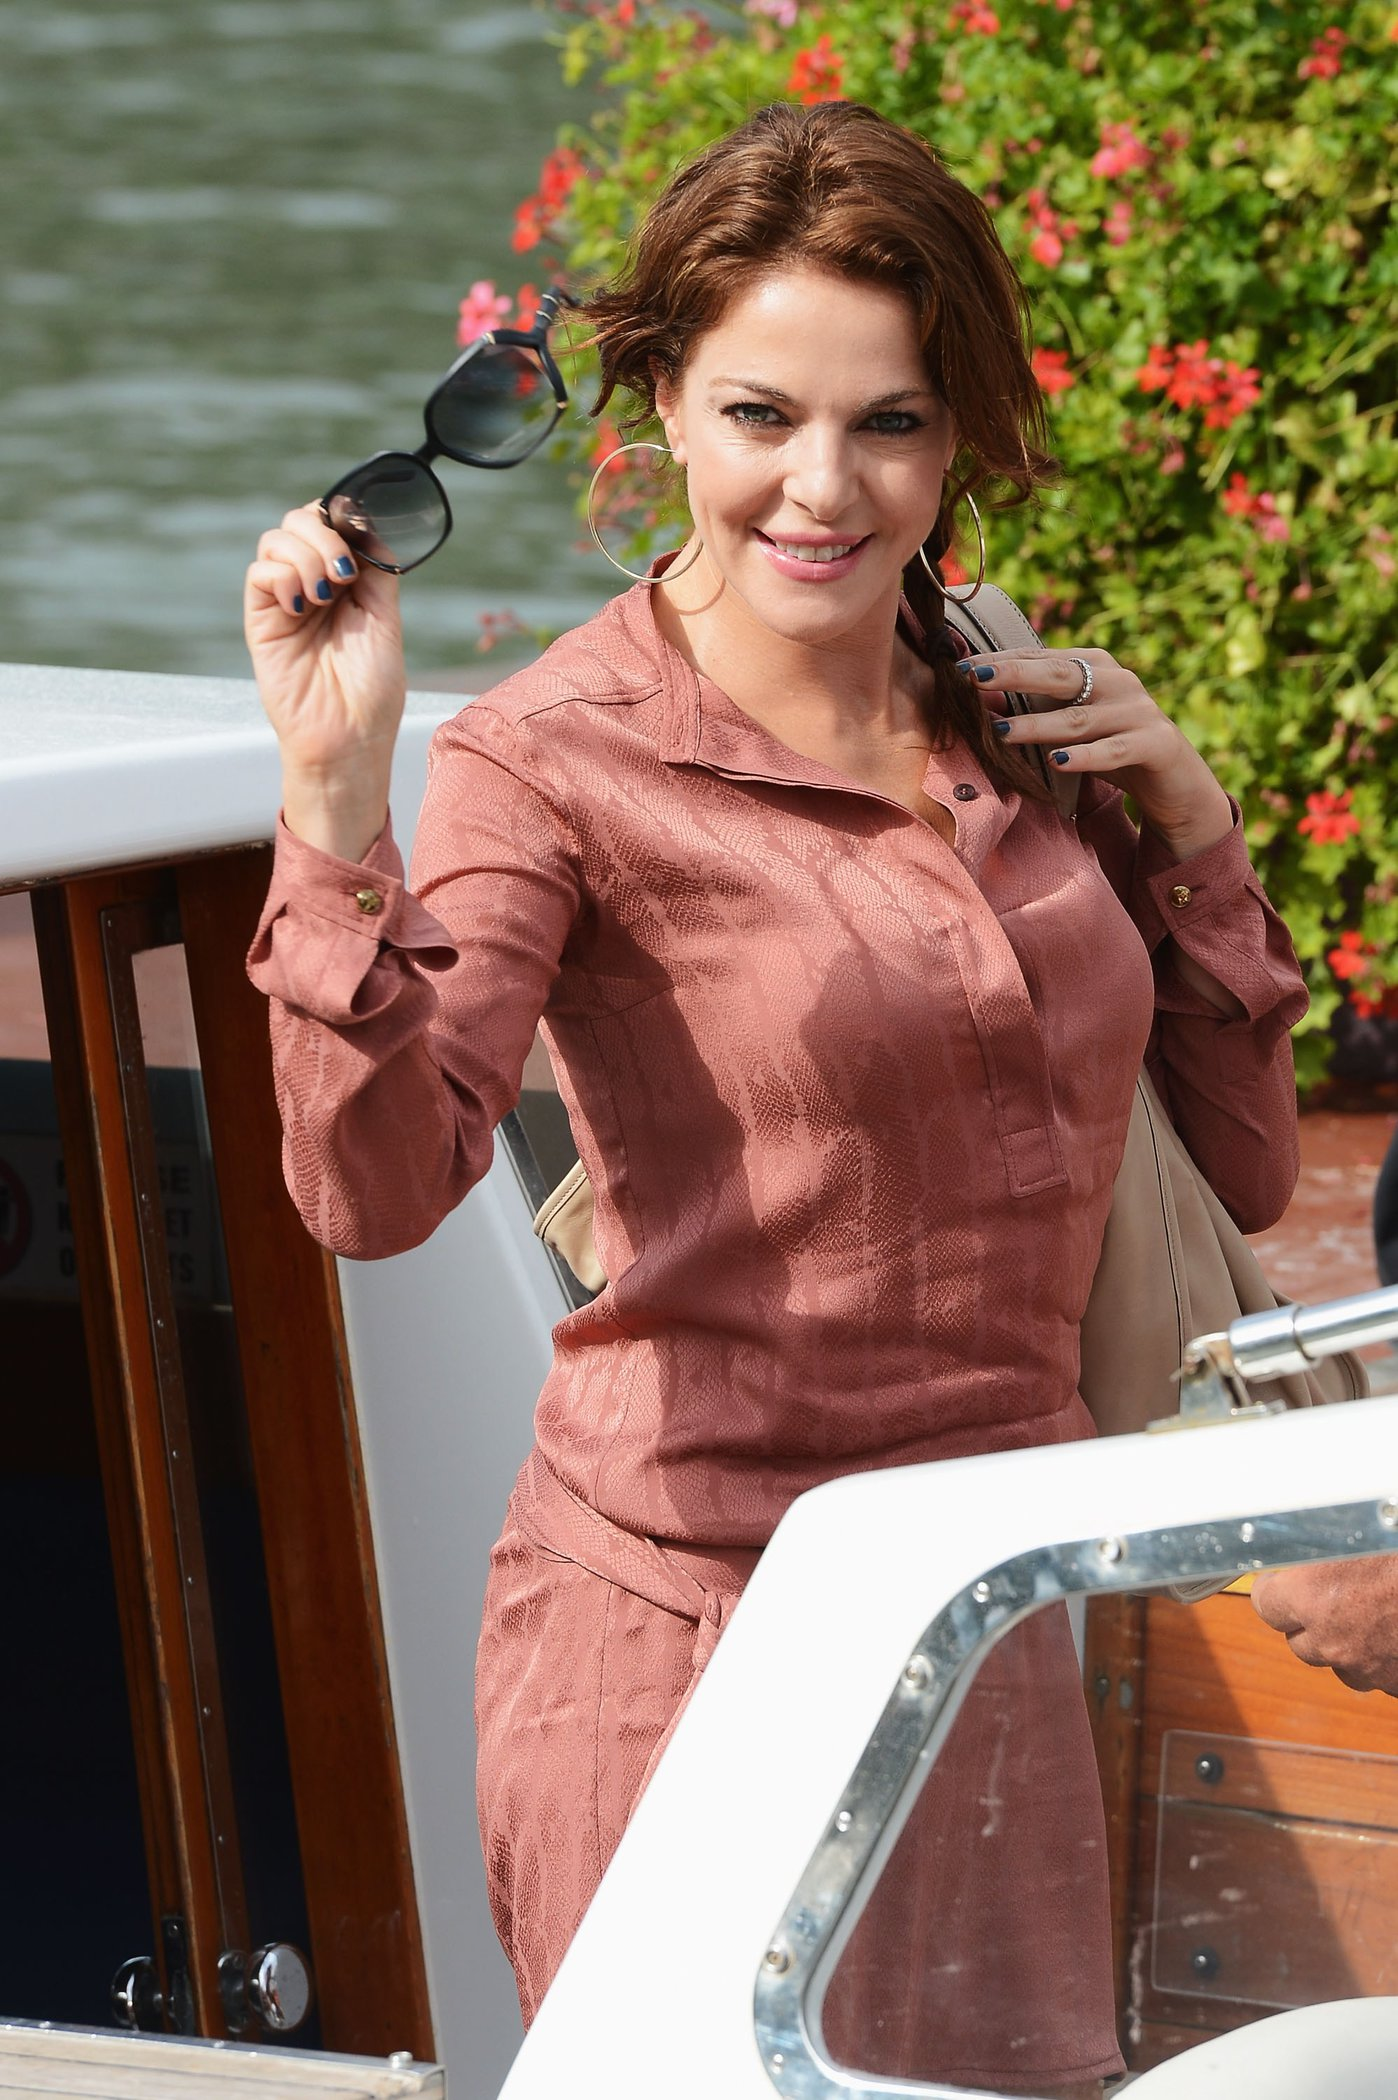 Claudia Gerini Spotted around the 69th Venice Film Festival in Venice, Italy (August 30, 2012)